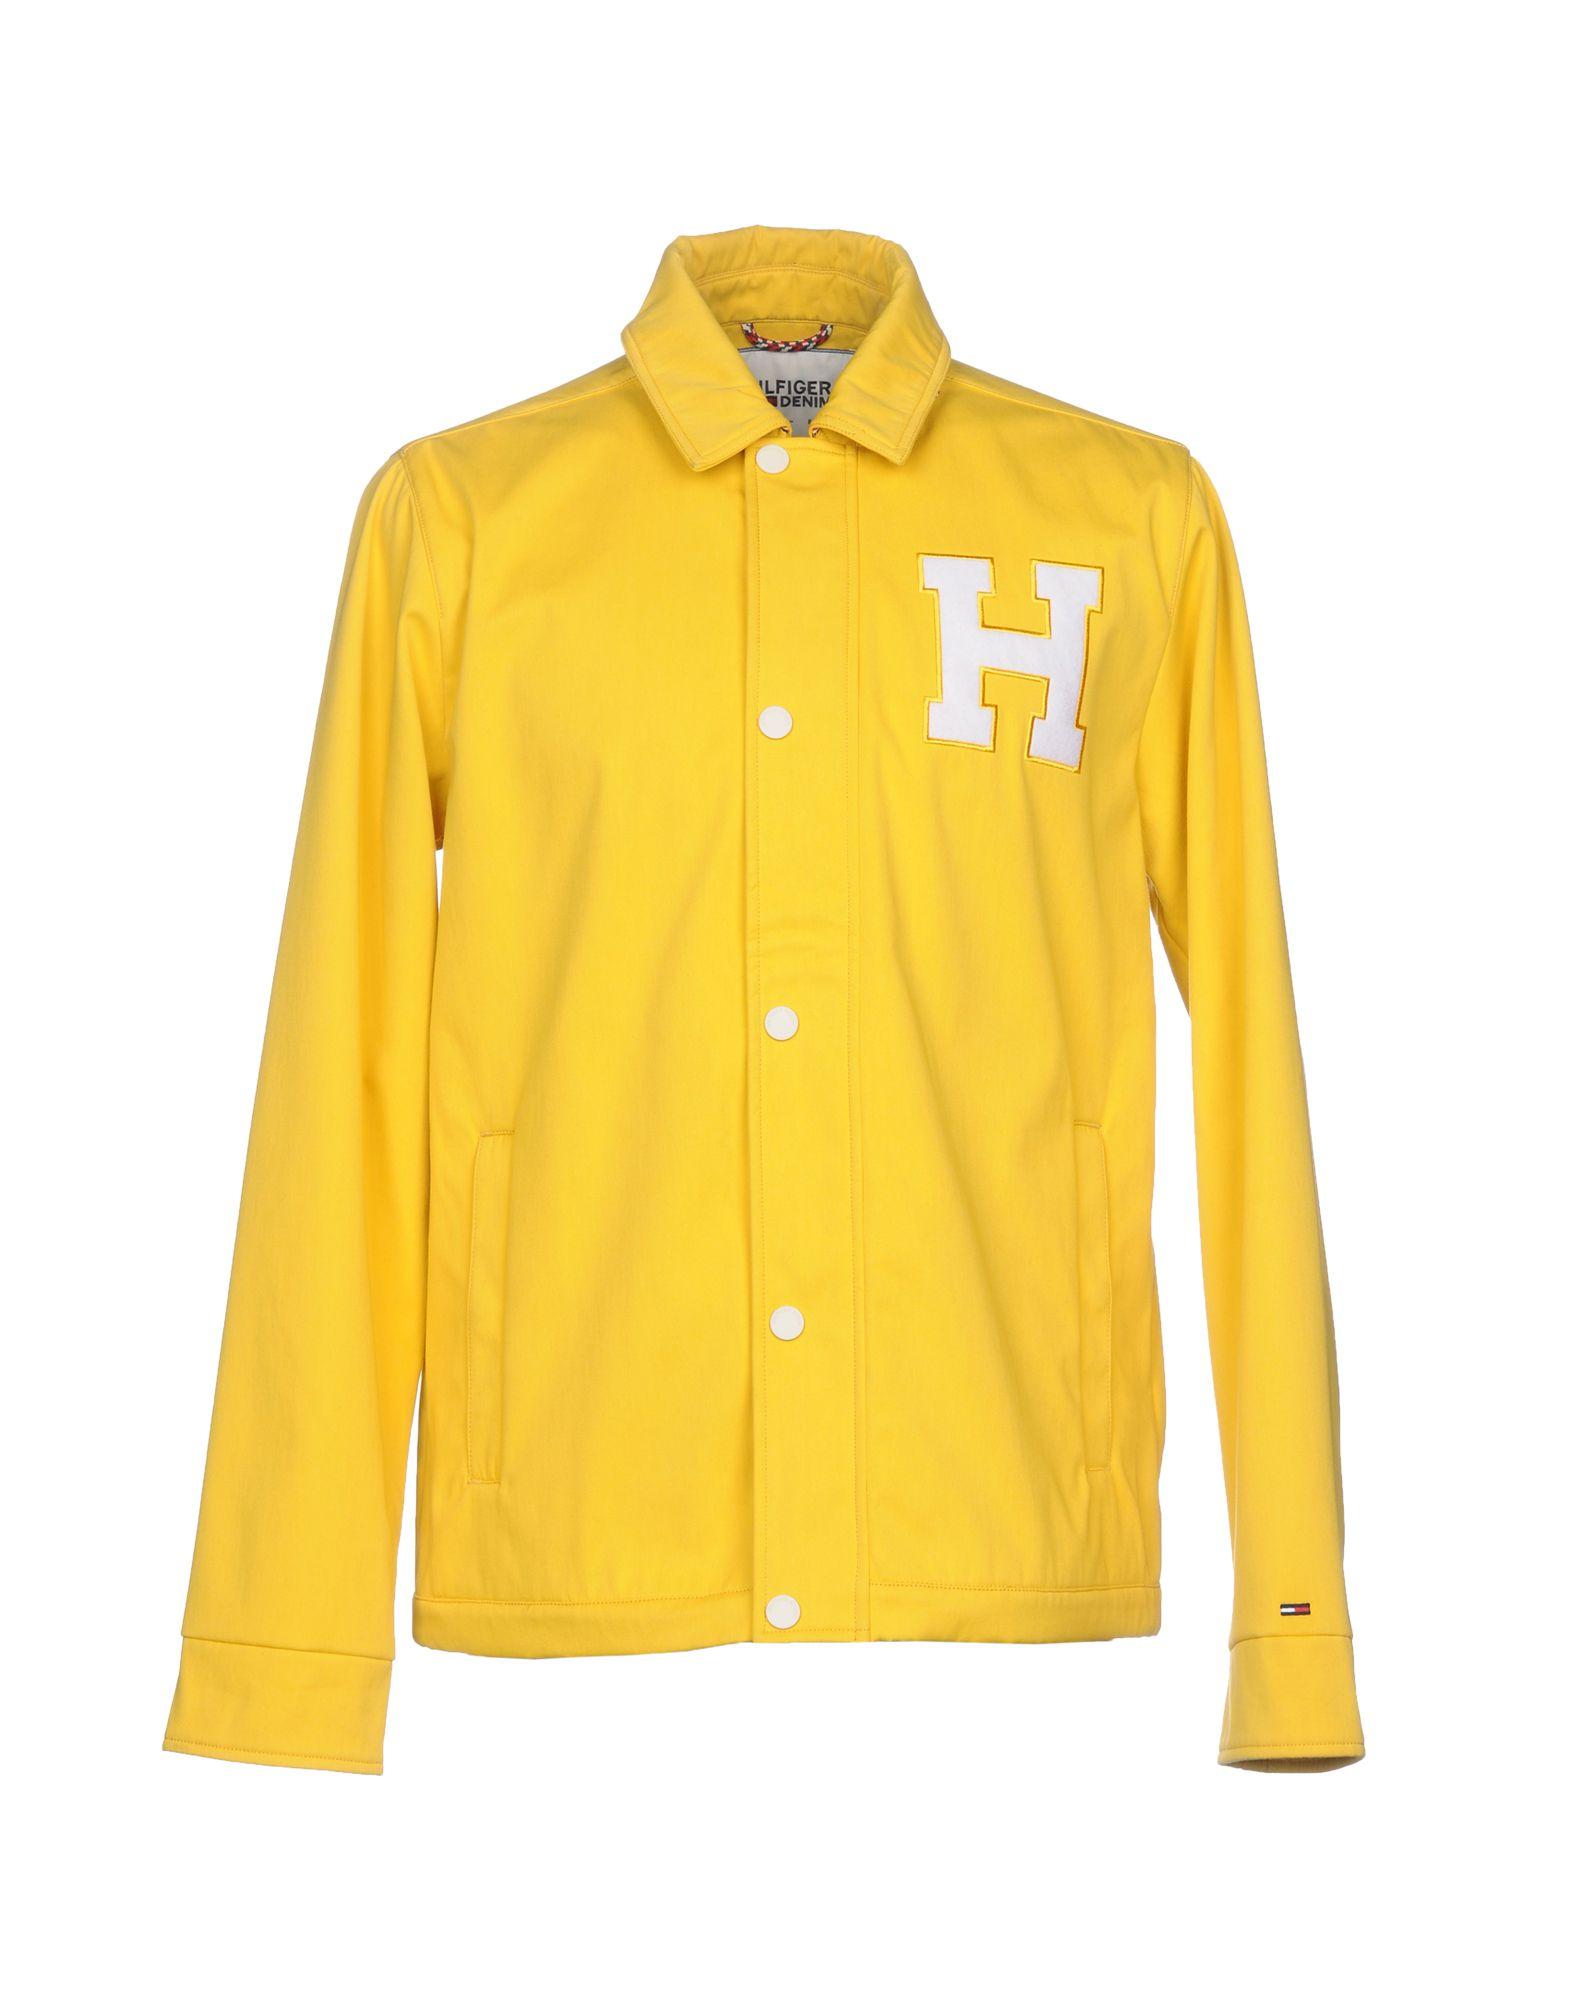 TOMMY HILFIGER DENIM Куртка футболка tommy hilfiger denim tommy hilfiger denim to013ewtpb98